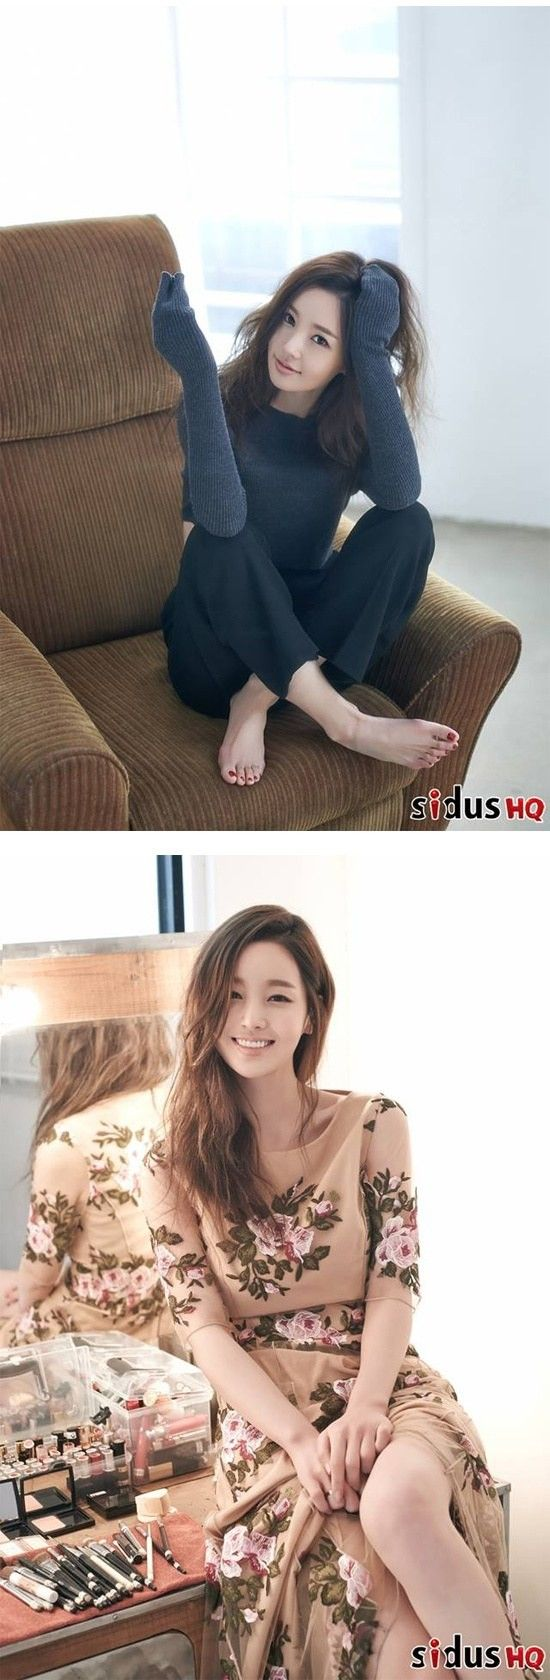 SidusHQ Releases Glamour Shots of Actress Nam Gyu Ri   Koogle TV